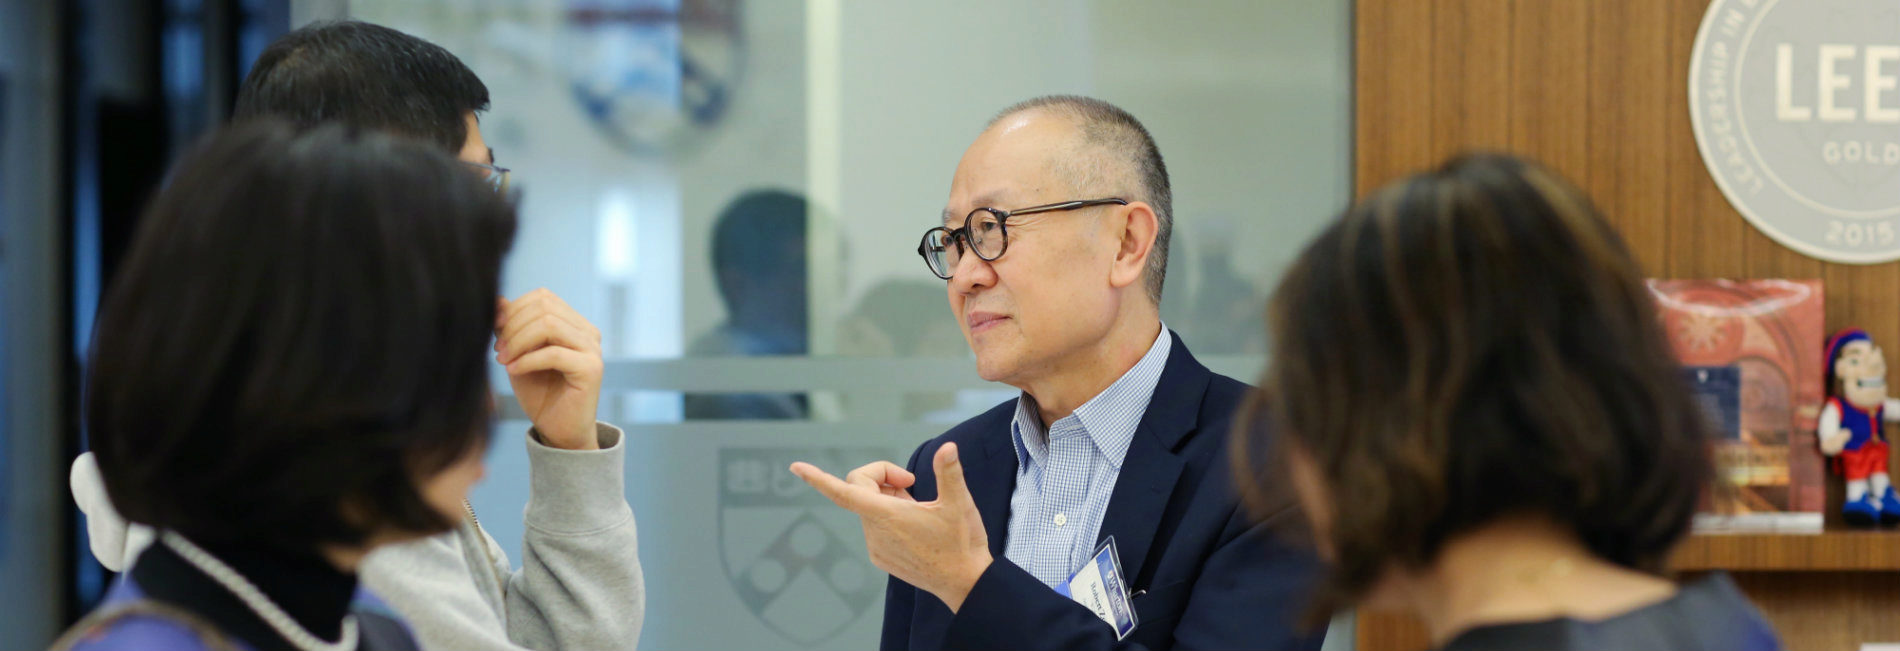 Robert Zou talking with attendees at the 3rd annual Penn Wharton Entrepreneurship Beijing Alumni Dinner.